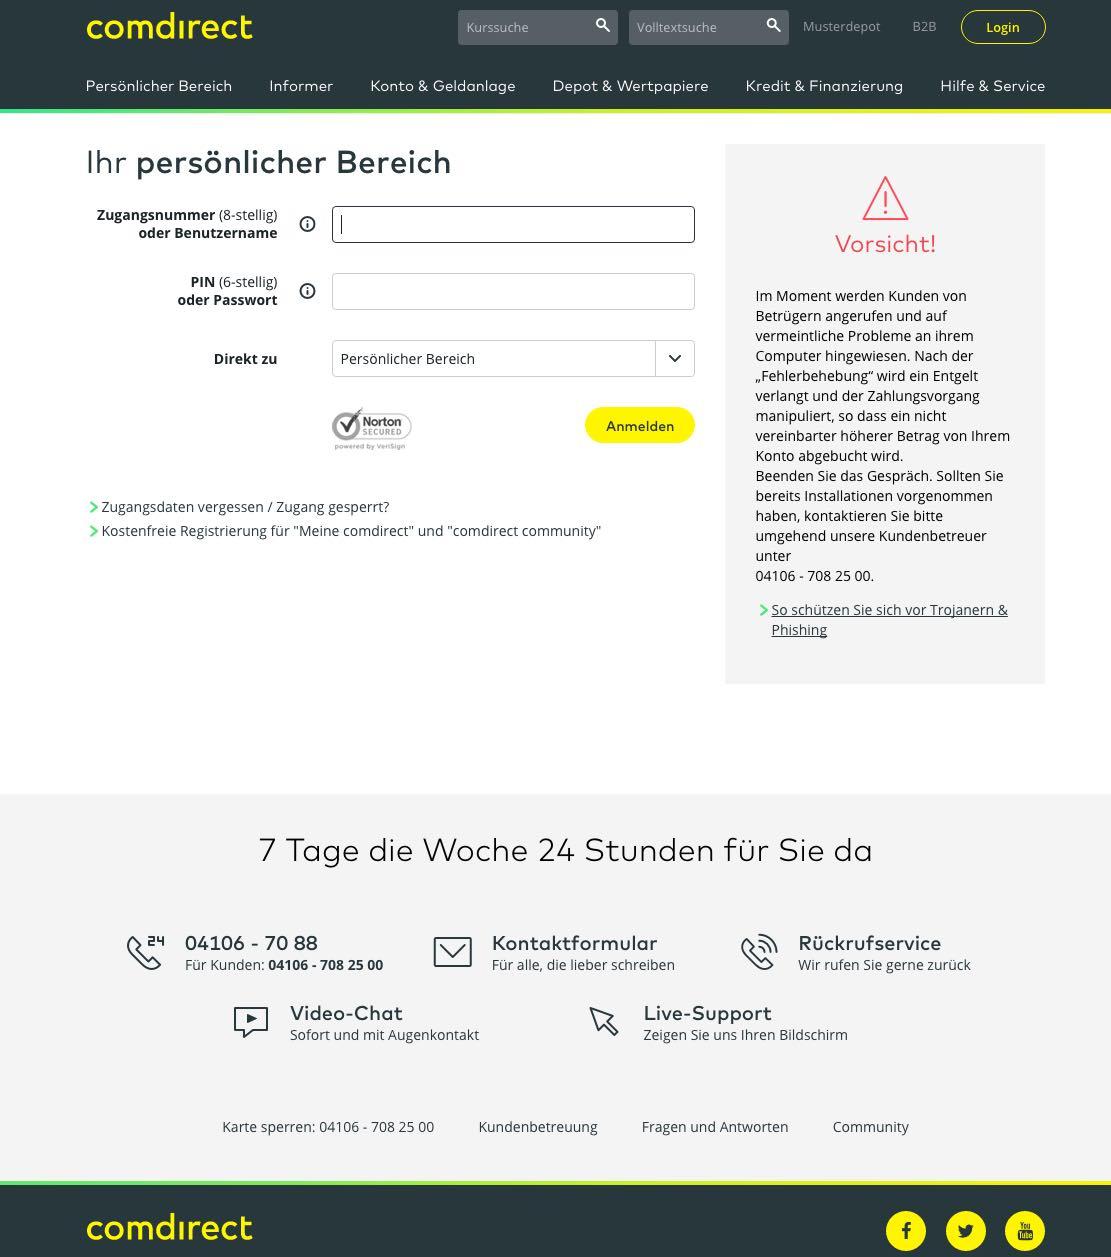 comdirect de online banking